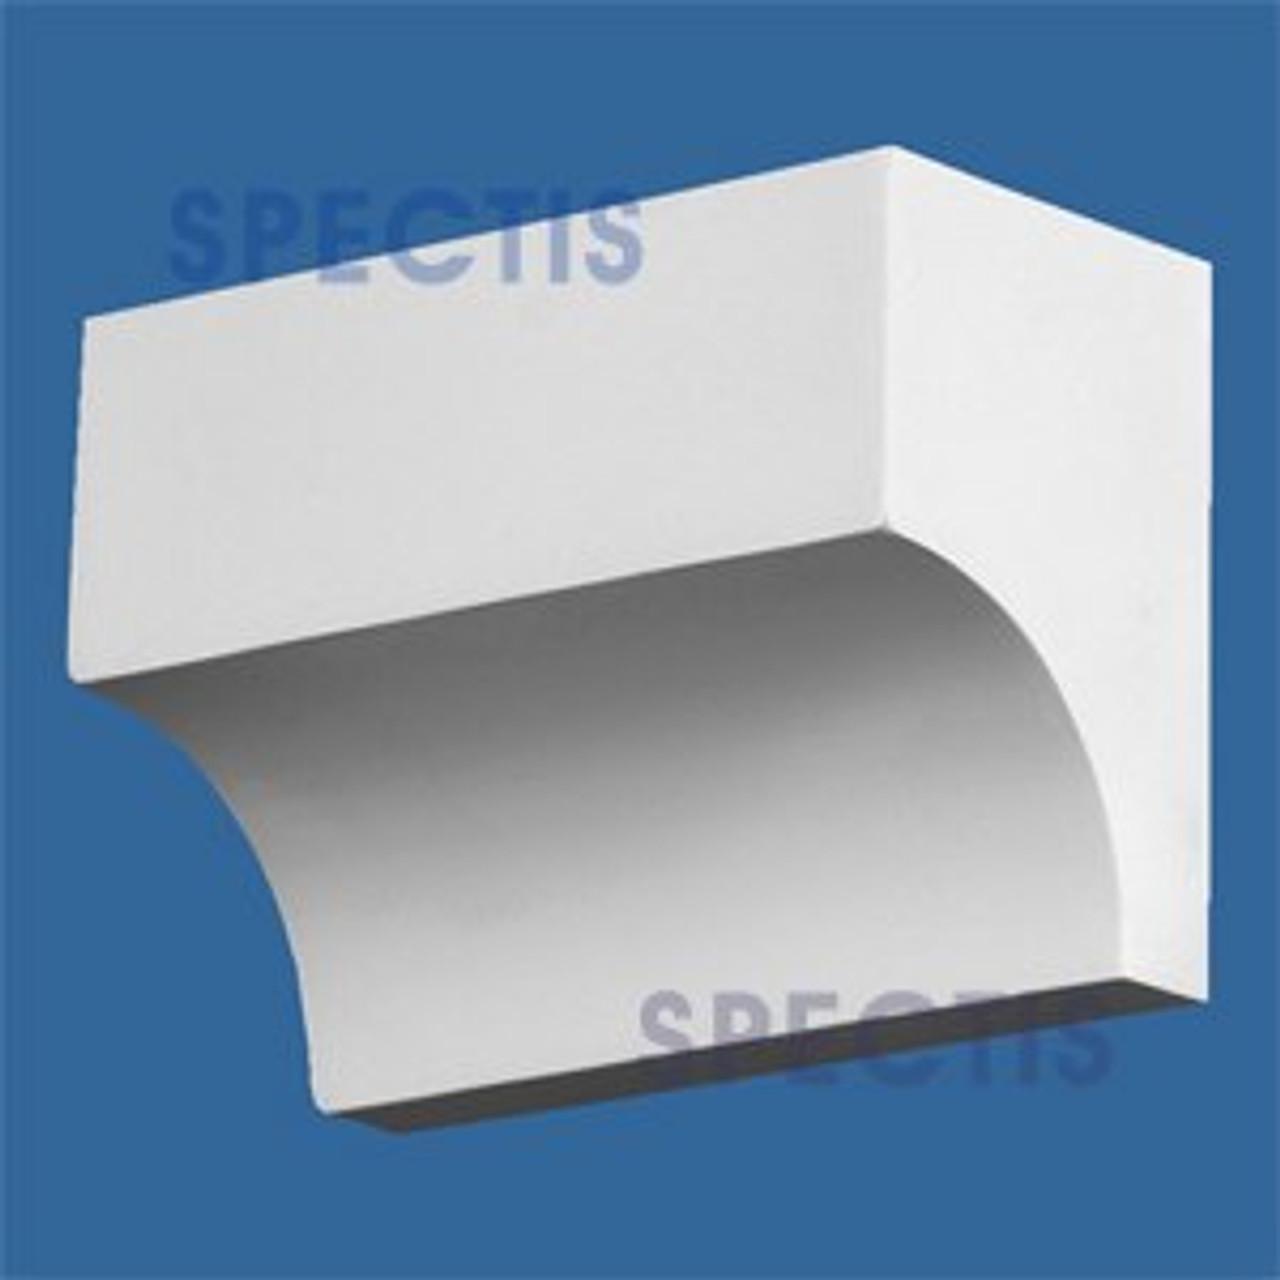 "BL2616 Corbel Block or Eave Bracket 4""W x 3""H x 2"" P"